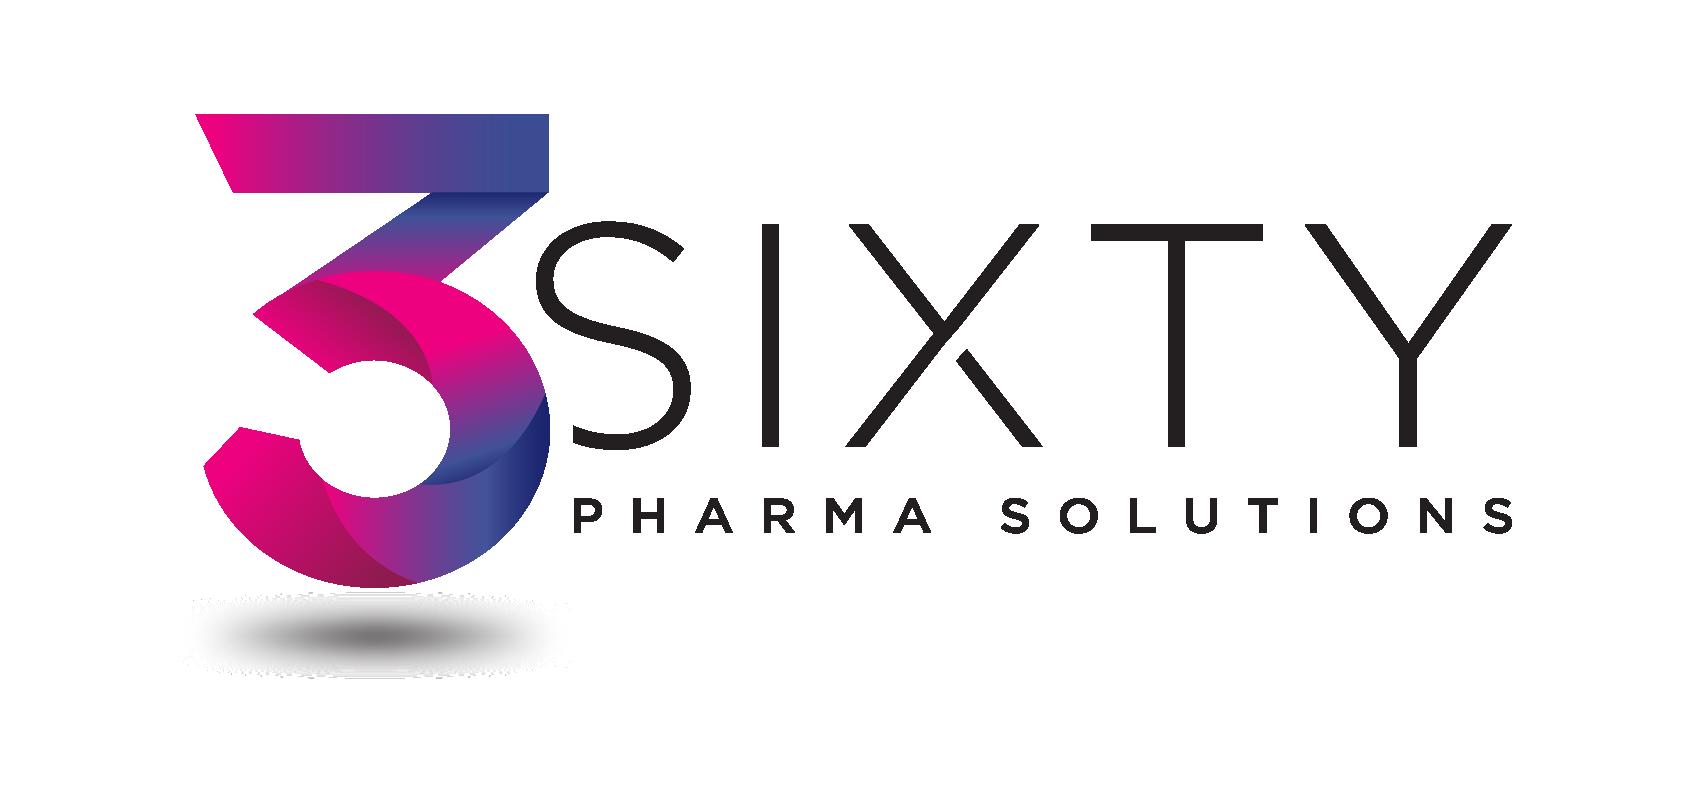 3sixty_logo_RGB_300.jpg.png